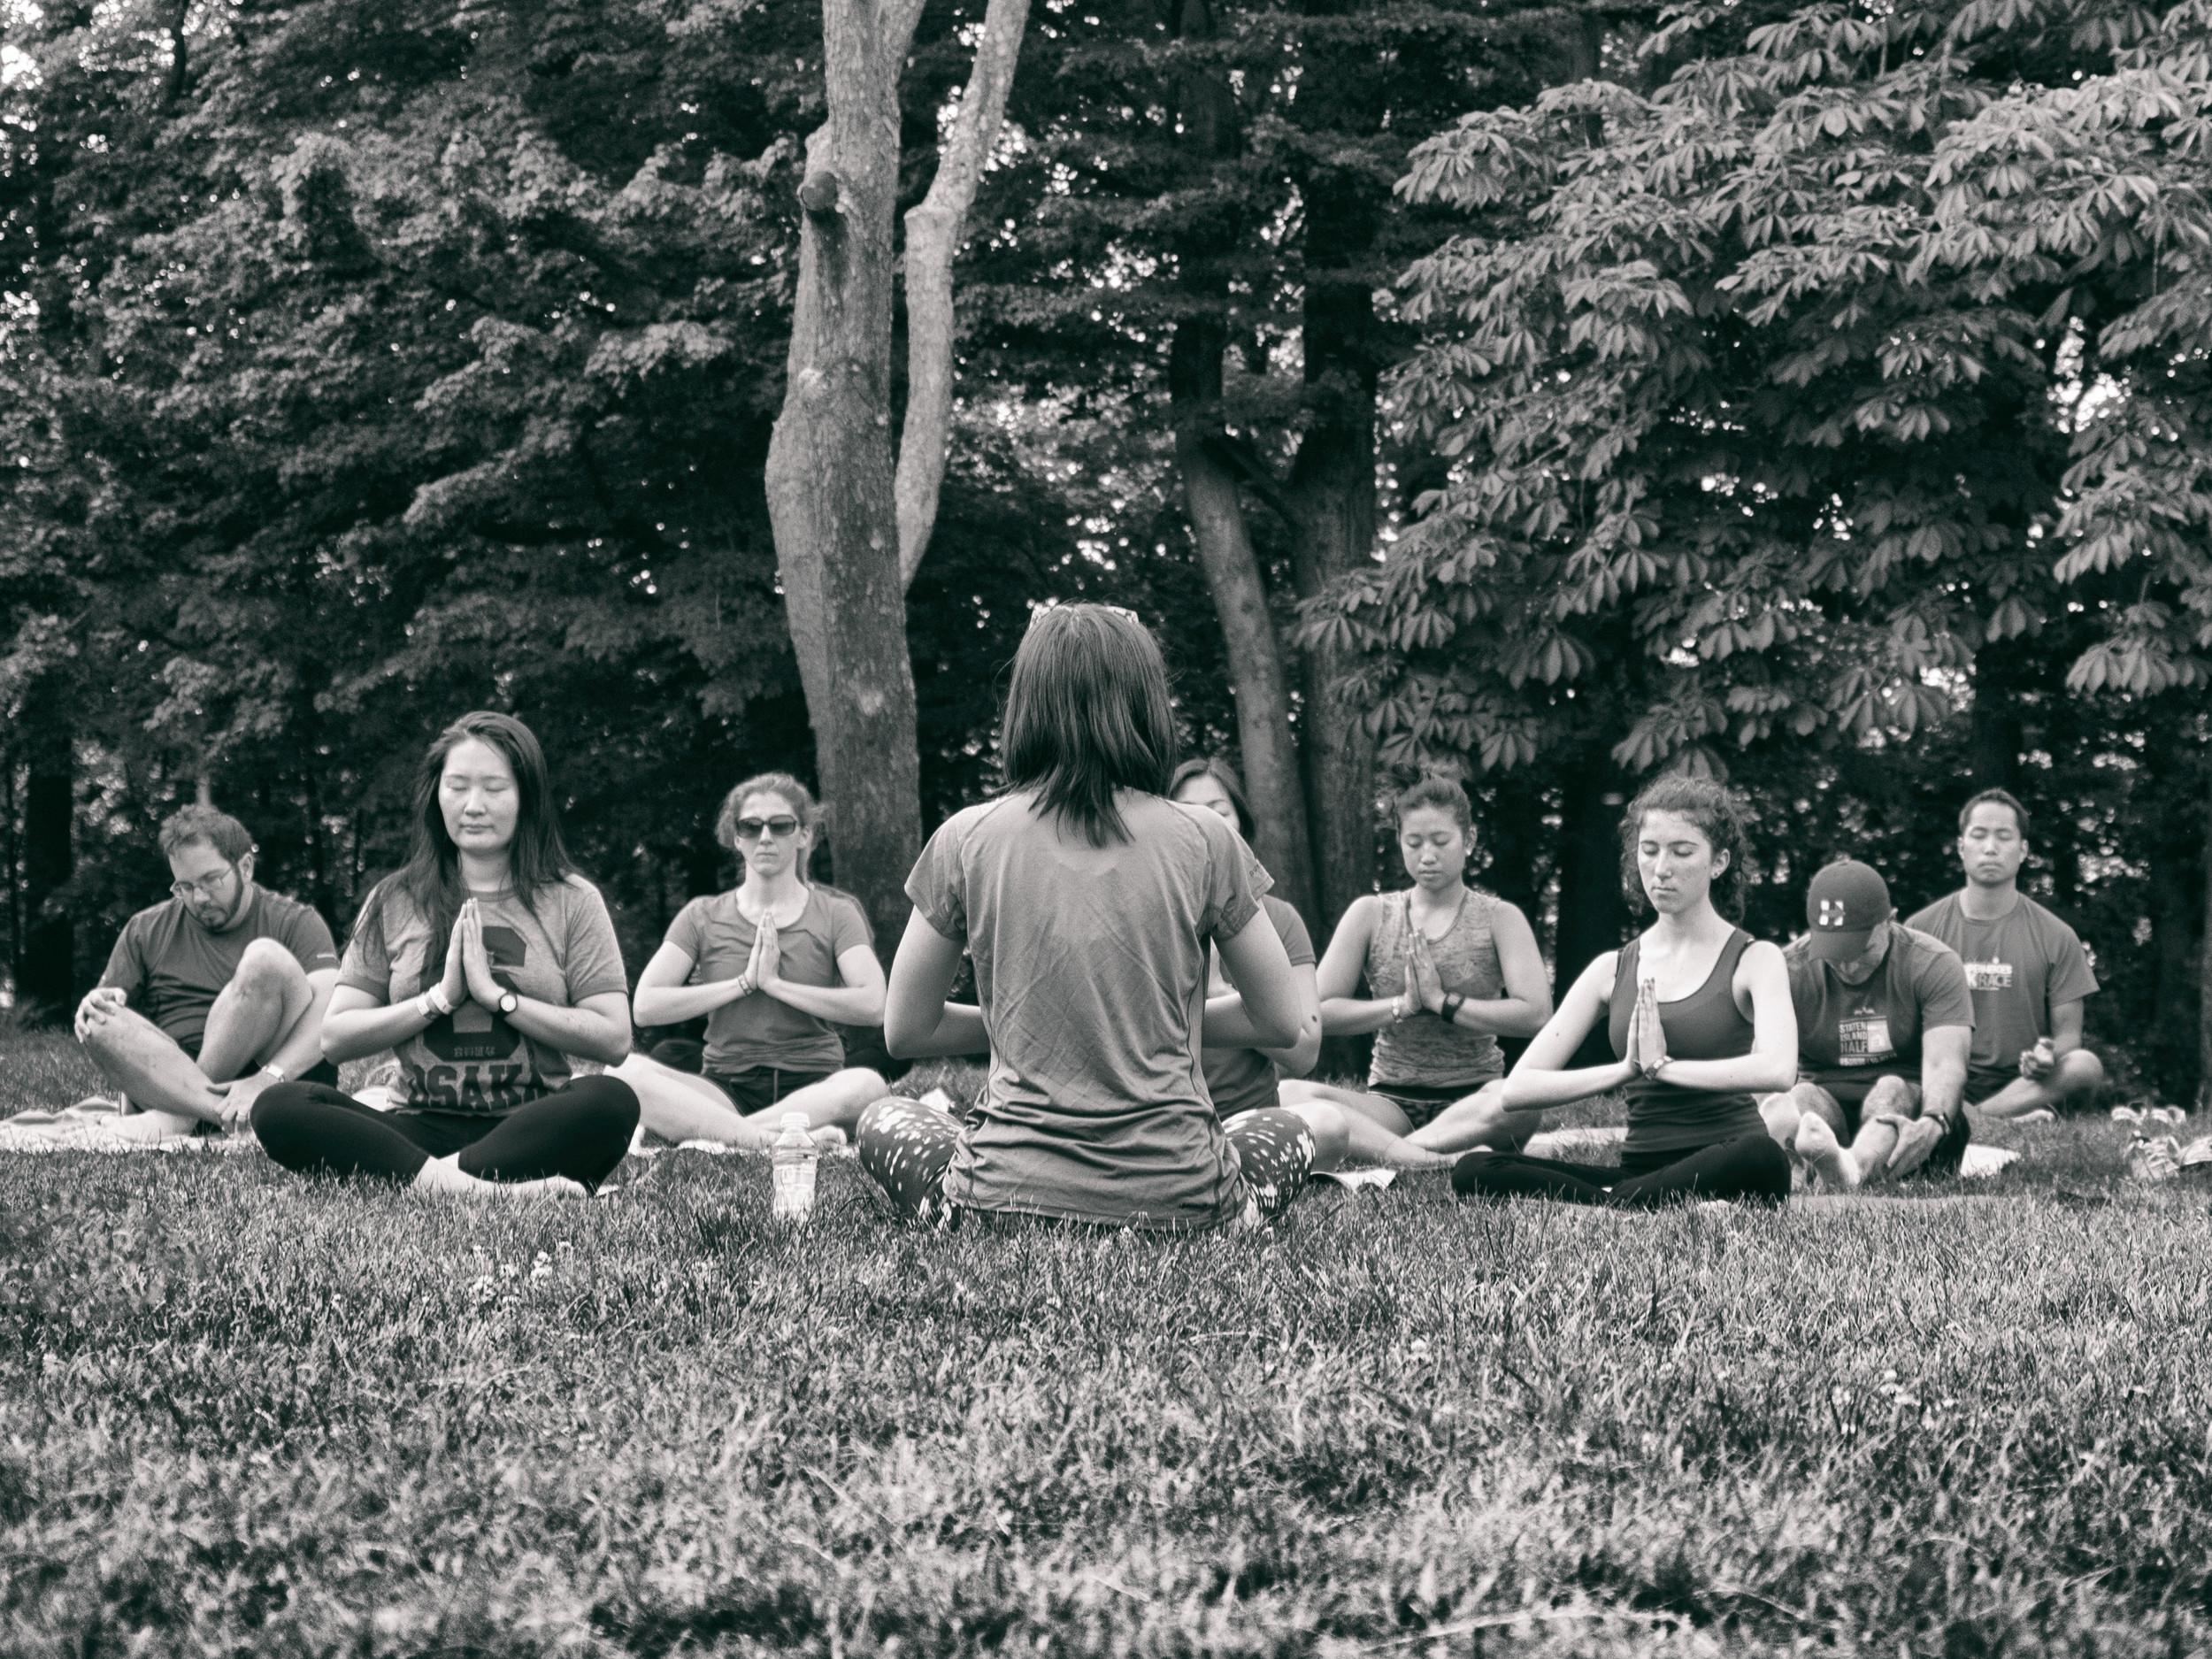 Pop Up Yoga NYC led an invigorating, hour long class. Photo by Tom O'Hare